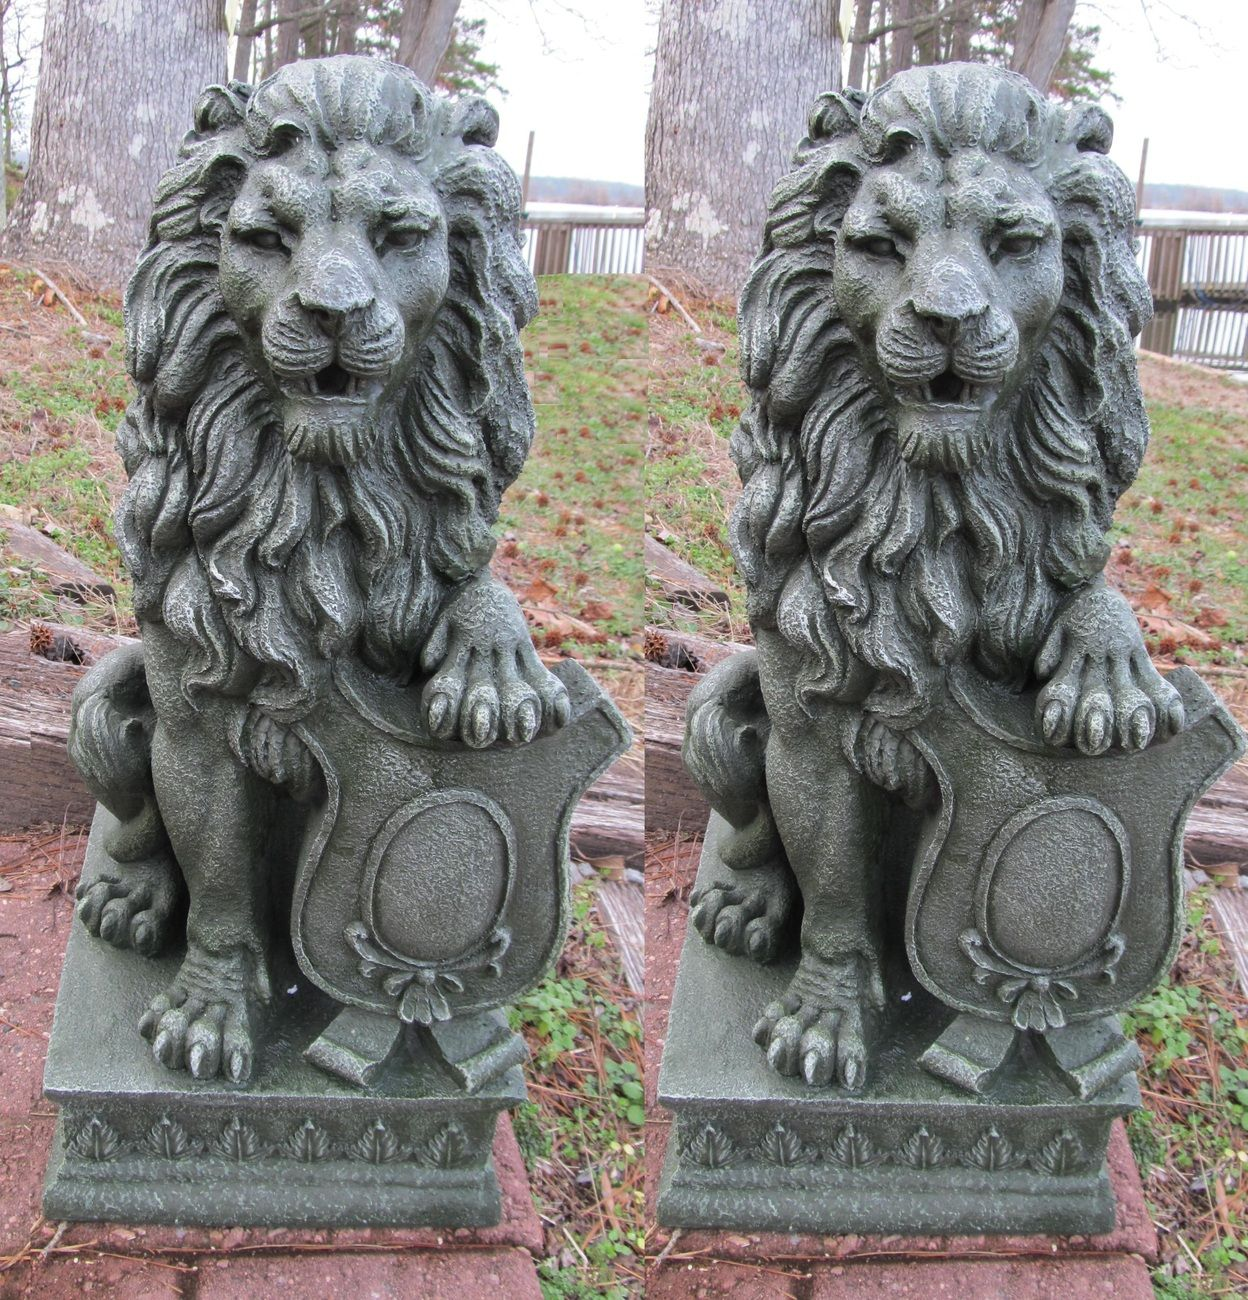 2 Lion Garden Driveway Figurine Statue Pair 25 Tall Statue Lion Sculpture Zeus Statue